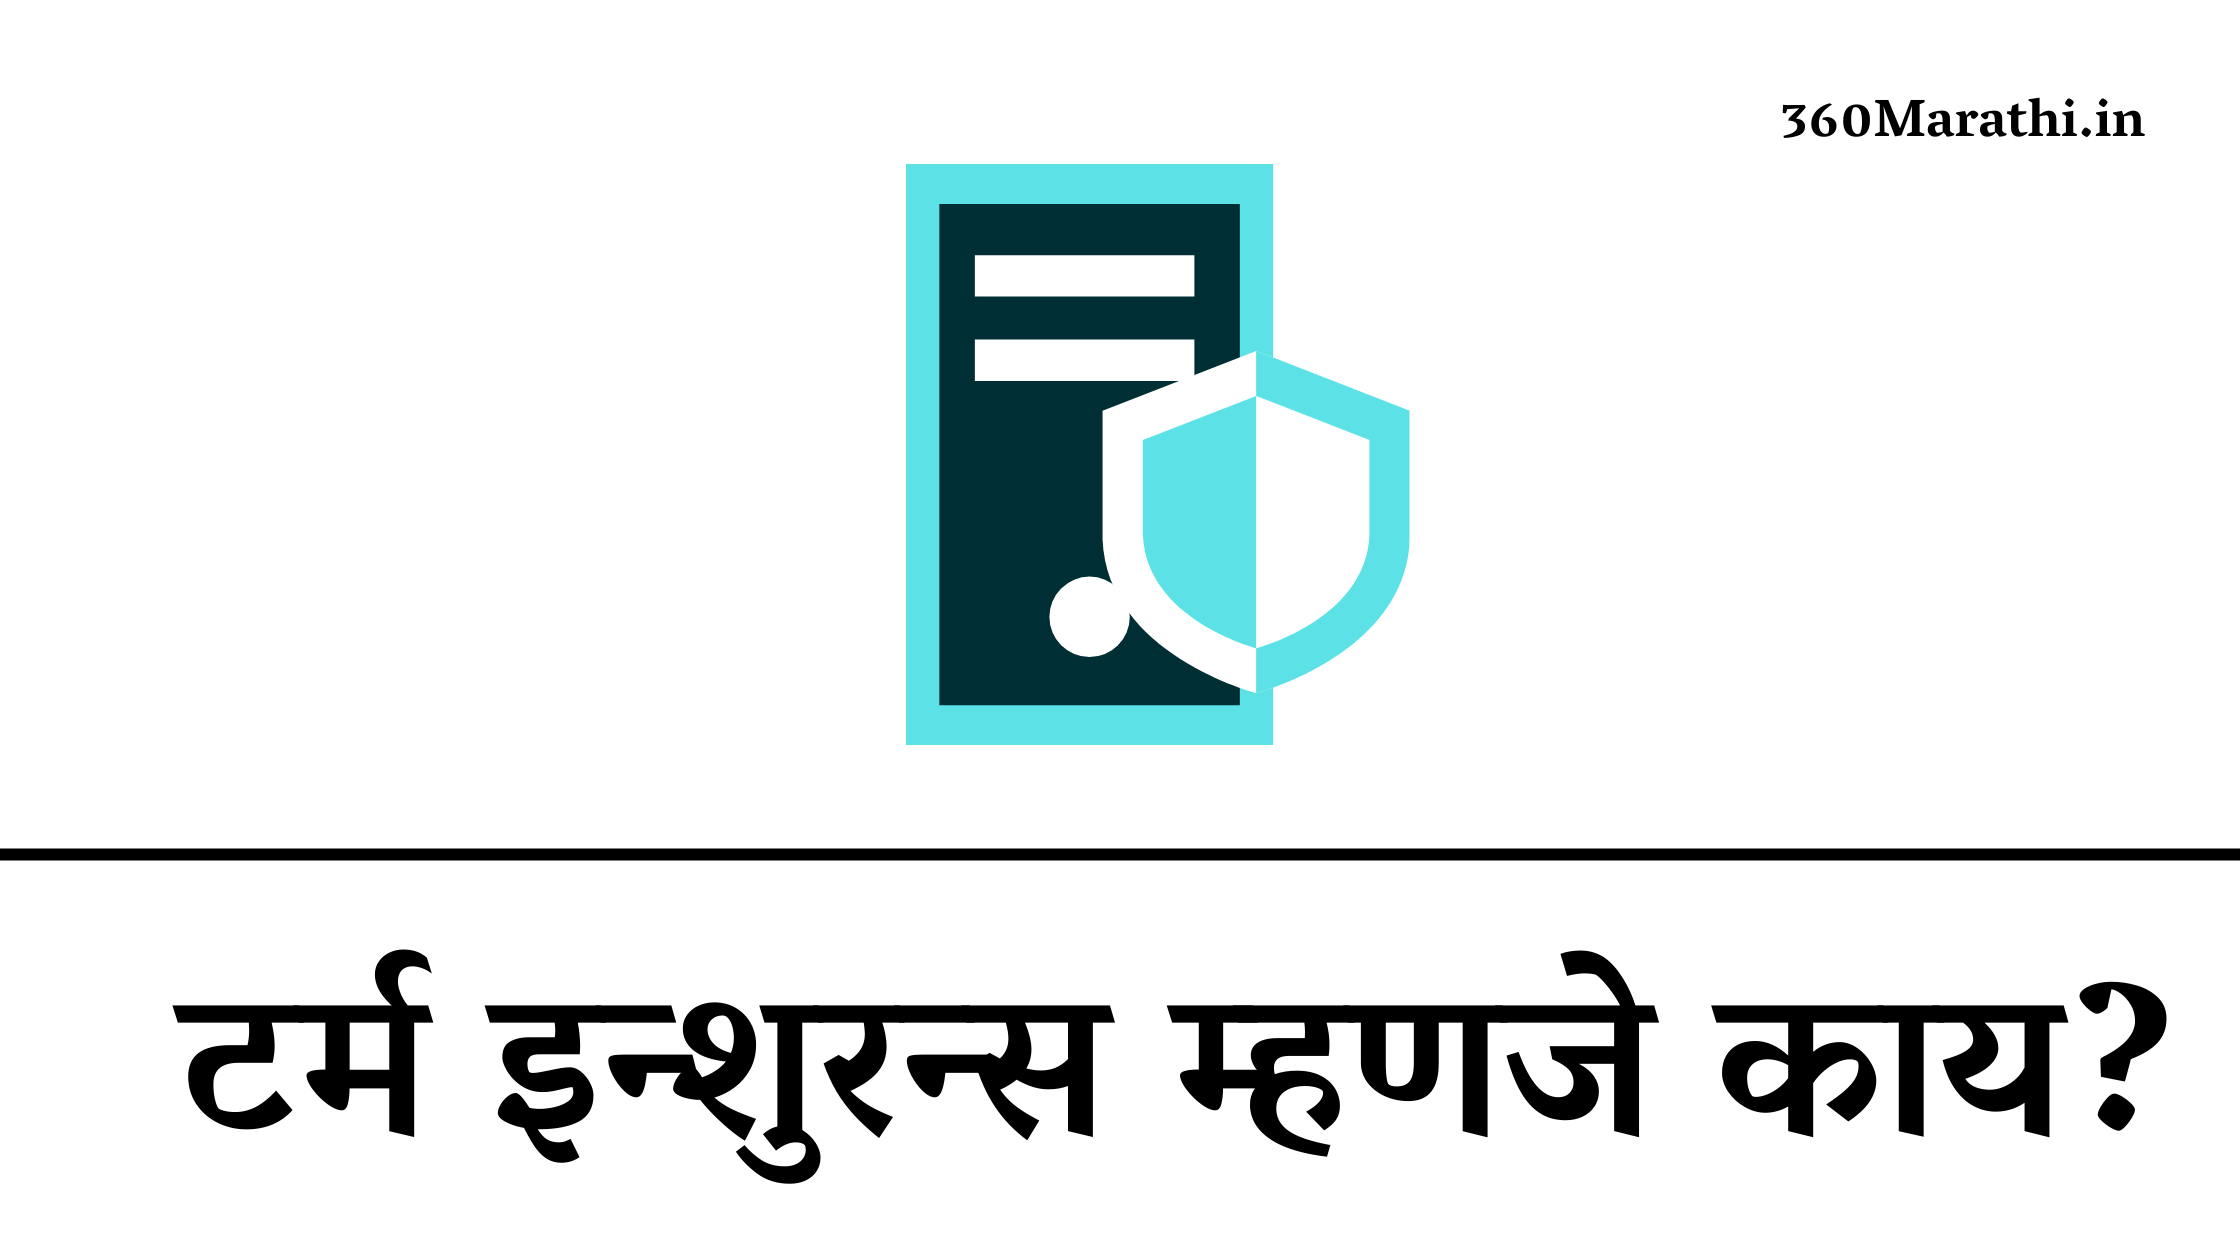 (संपूर्ण माहिती) टर्म इन्शुरन्स म्हणजे काय? | Term Insurance in Marathi | Term Insurance Investment Information In Marathi